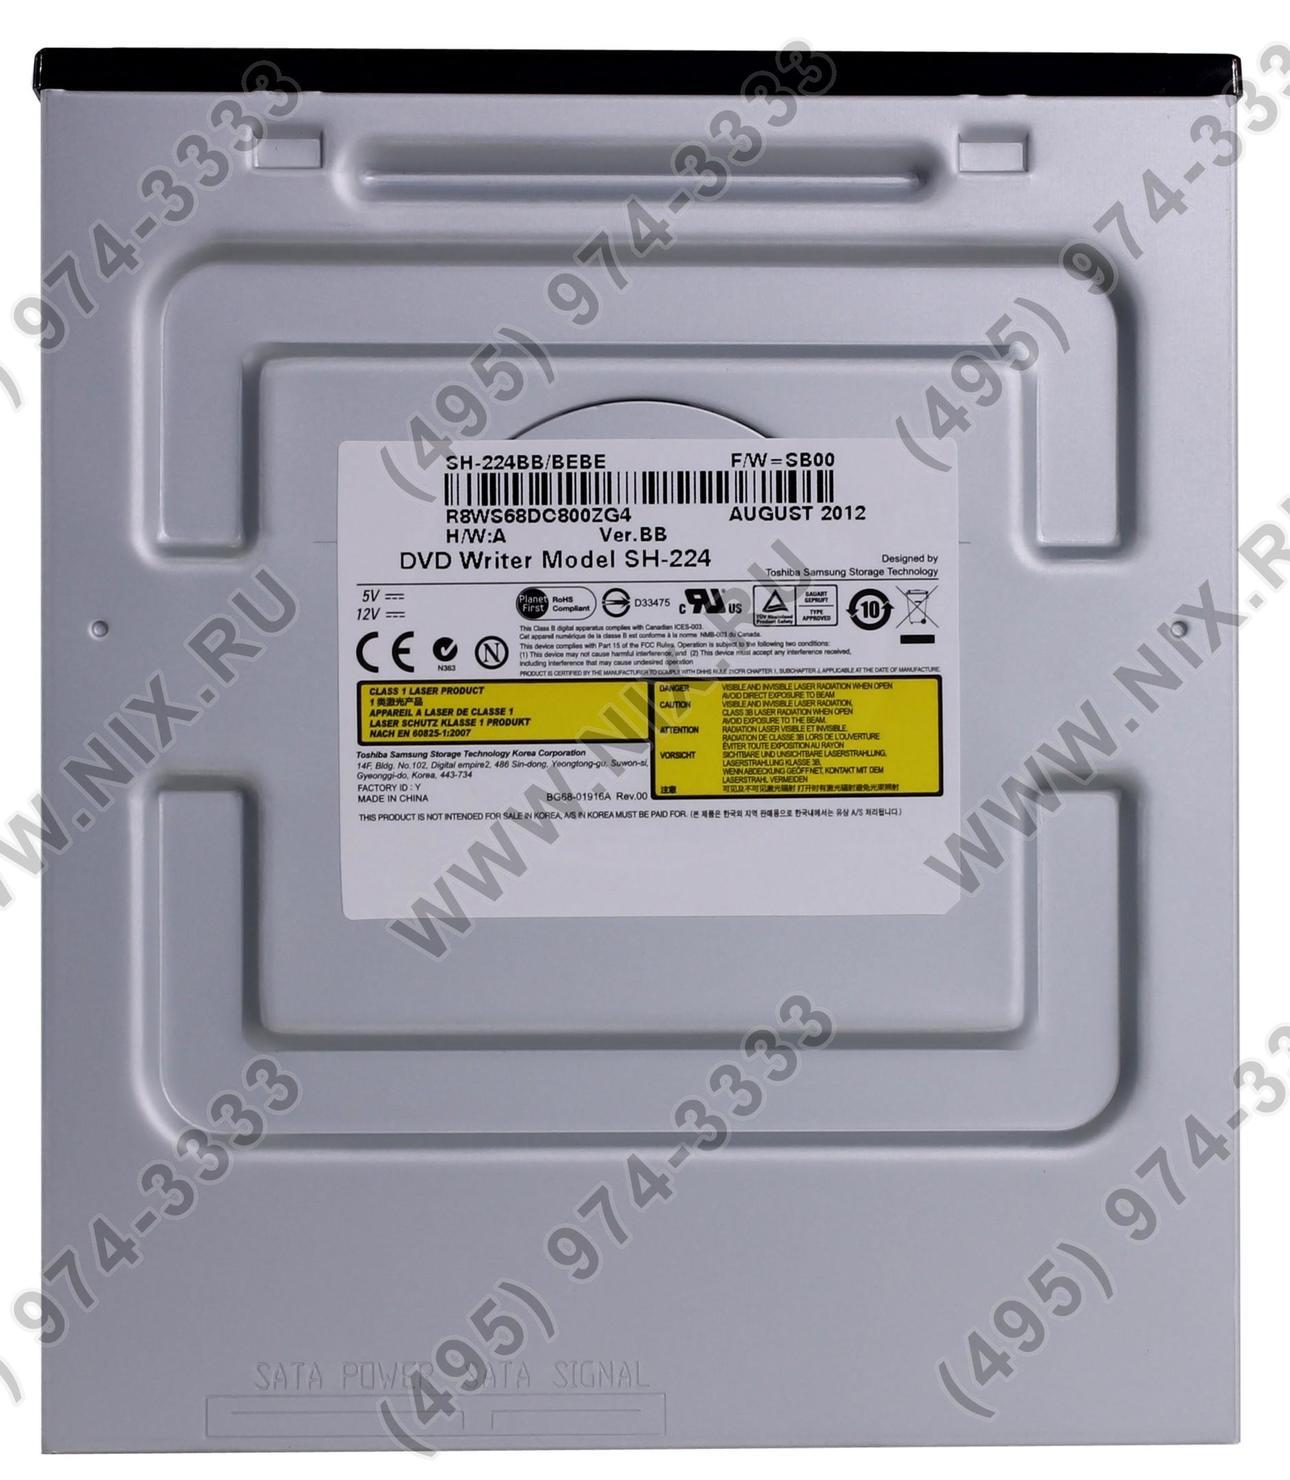 Sh224bb driver cddvdw tsstcorp